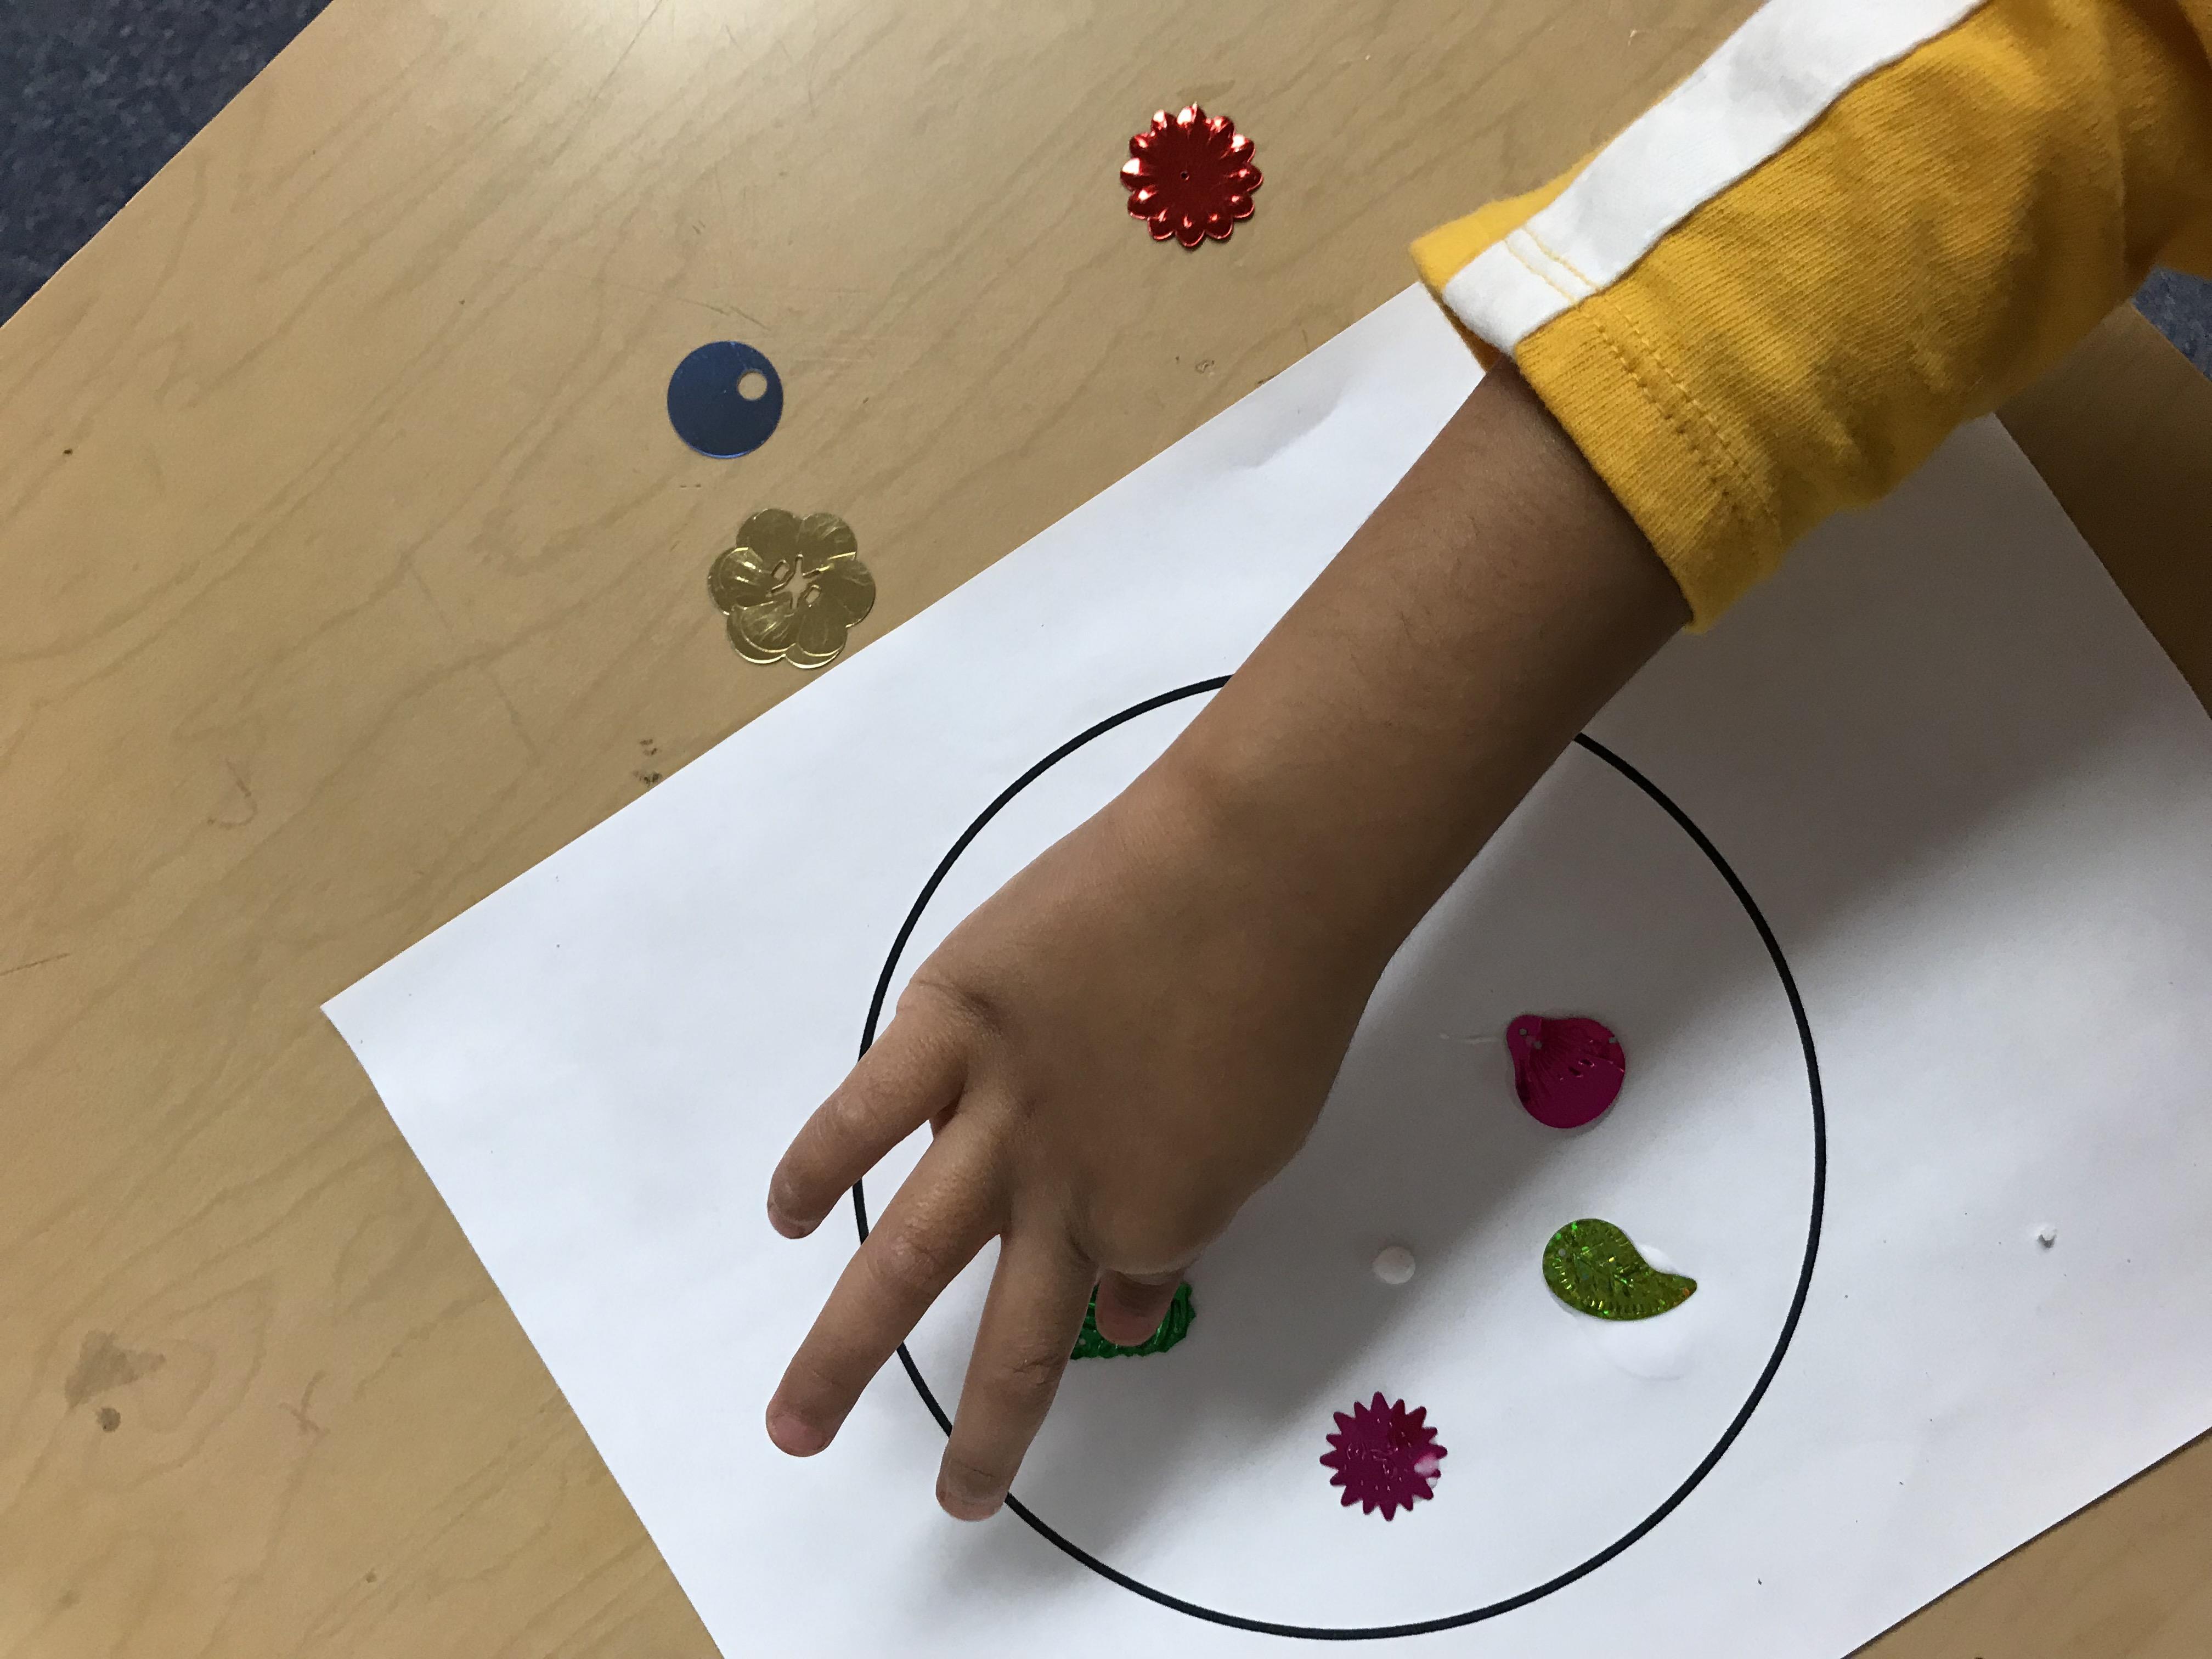 Kid placing various shapes in print out circle